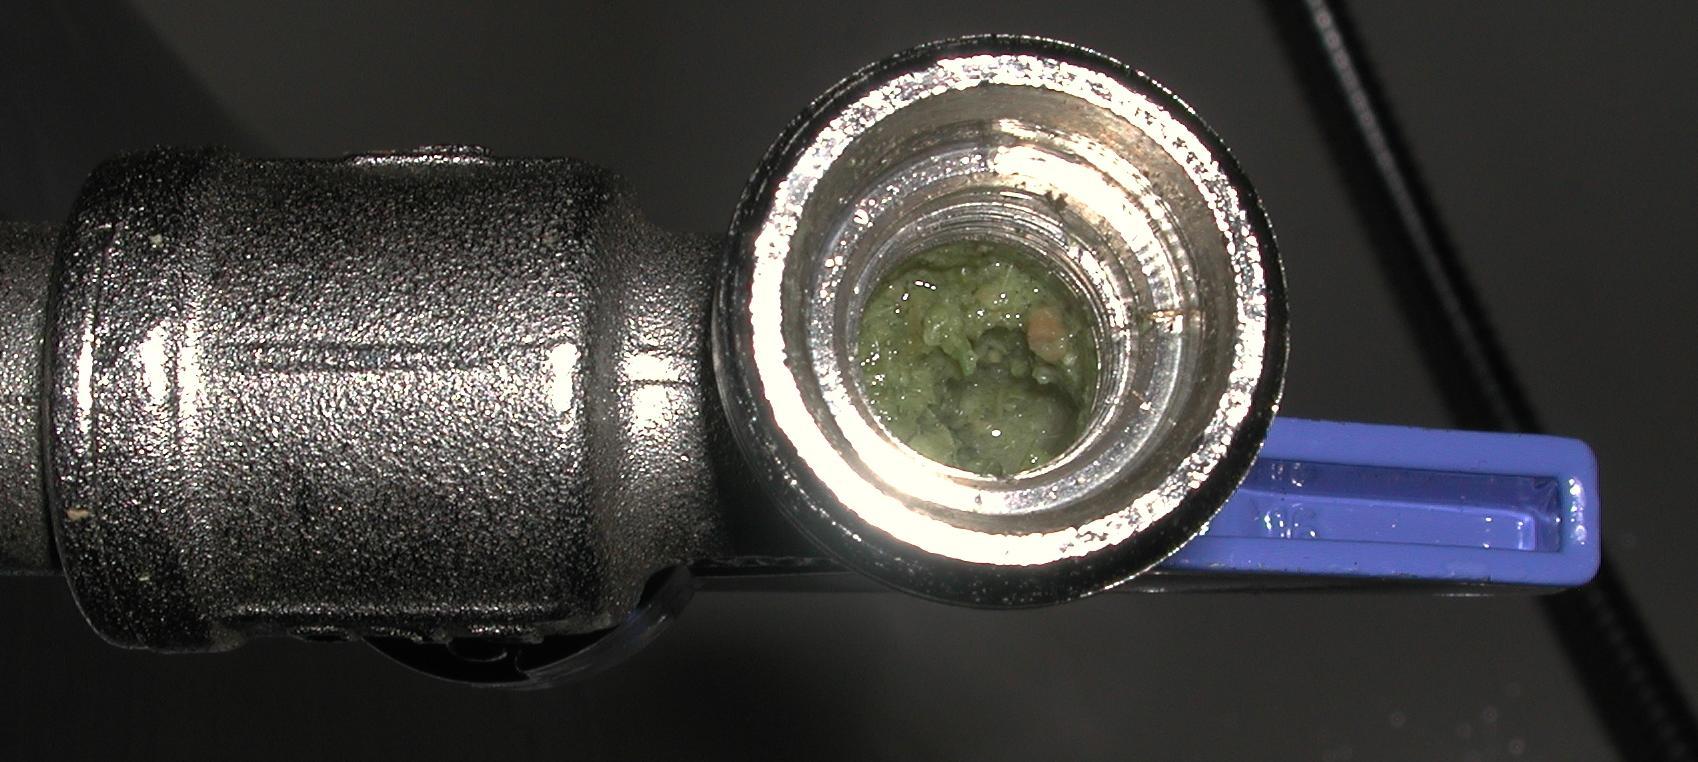 tap-2.jpeg